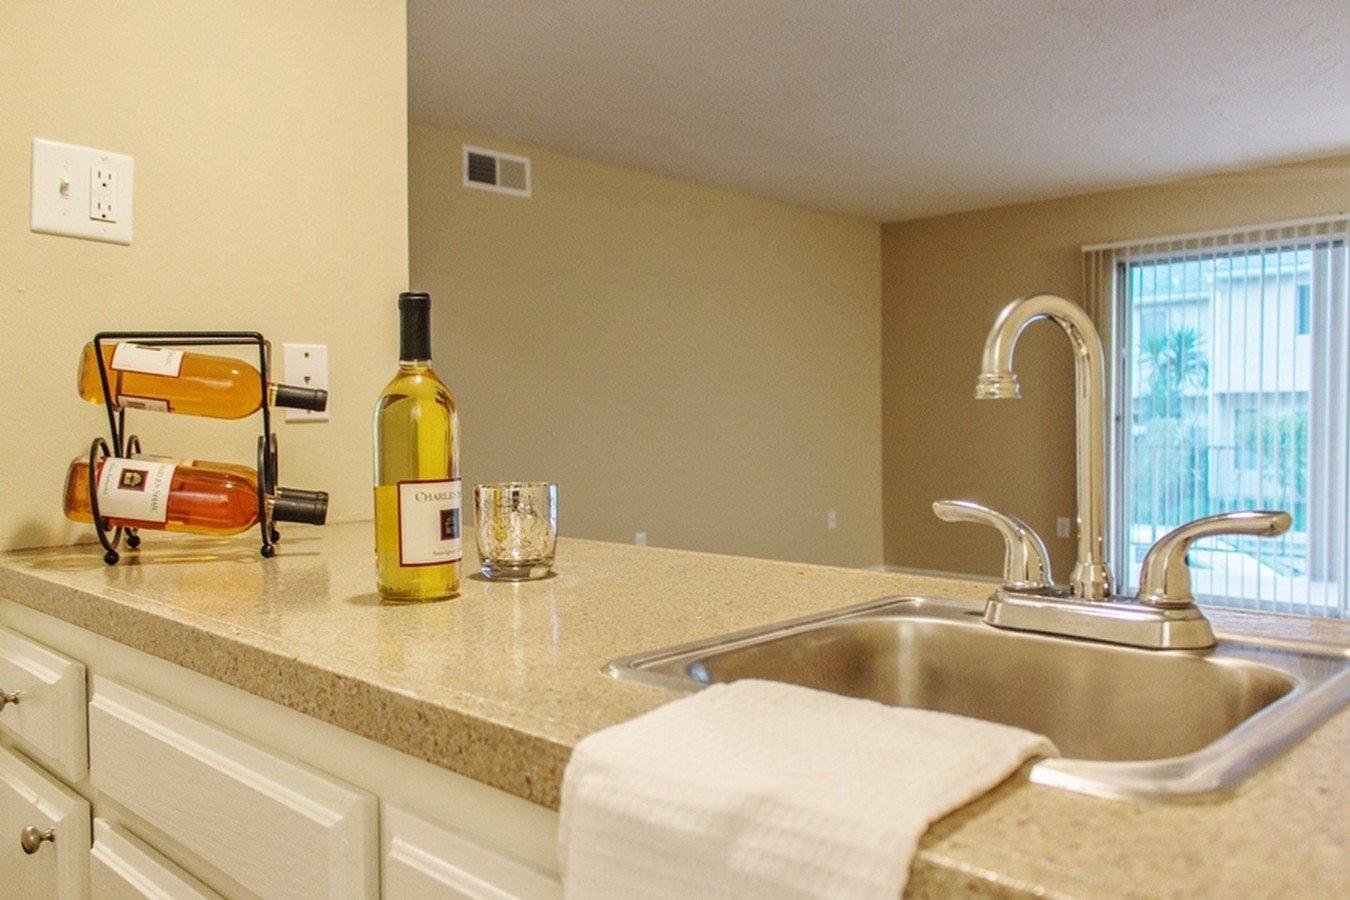 2 Bedrooms 2 Bathrooms Apartment for rent at Willis Park East in Sherman Oaks, CA